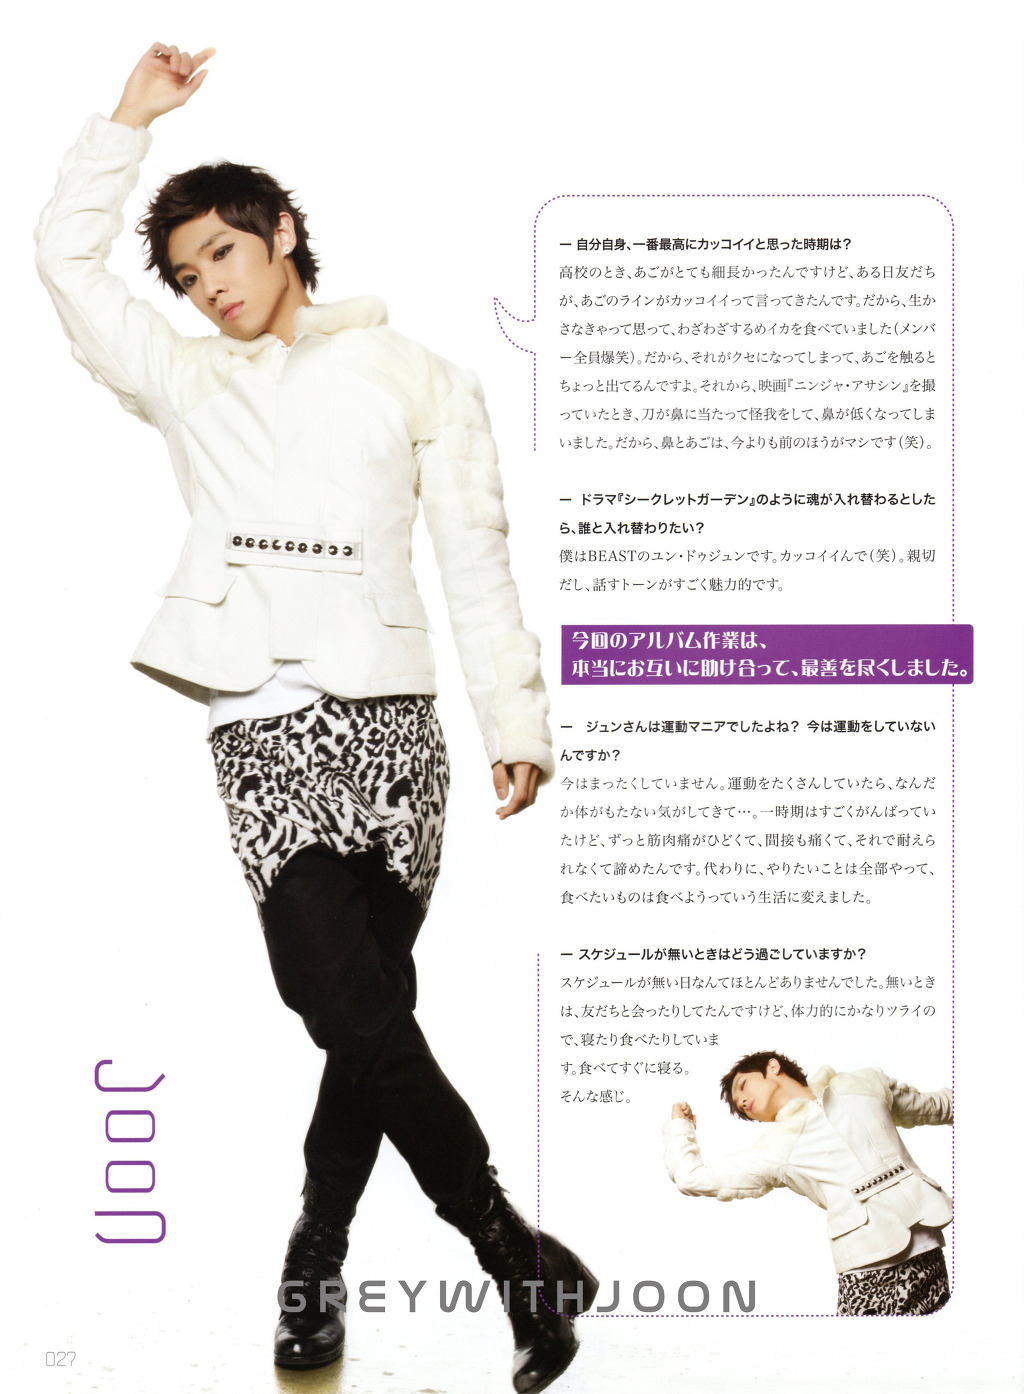 [01.03.11]MBLAQ @ CREA STAR Scan6